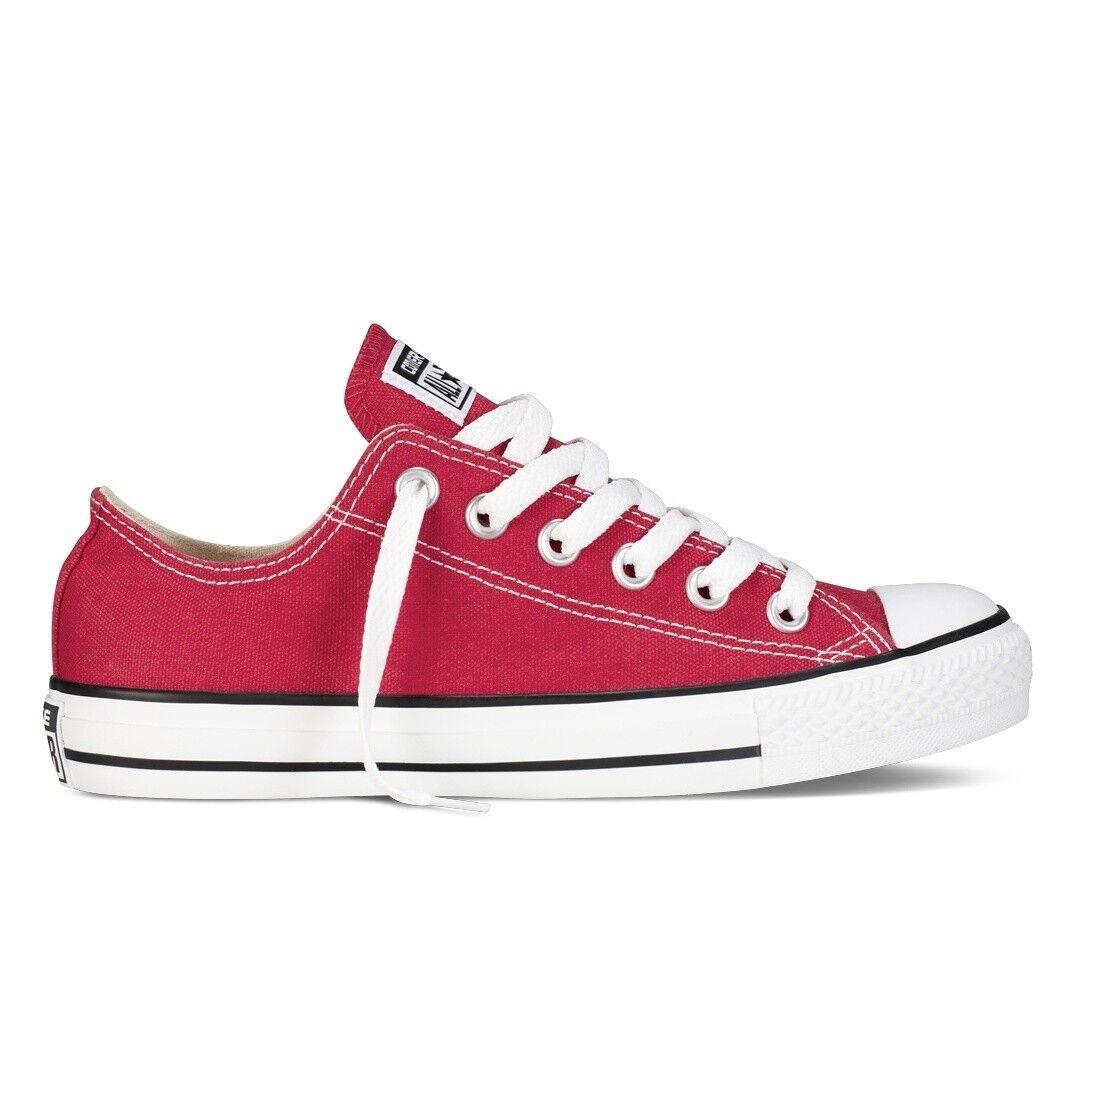 CONVERSE All Star Chuck Taylor Ox Schuhe Sneaker red M9696